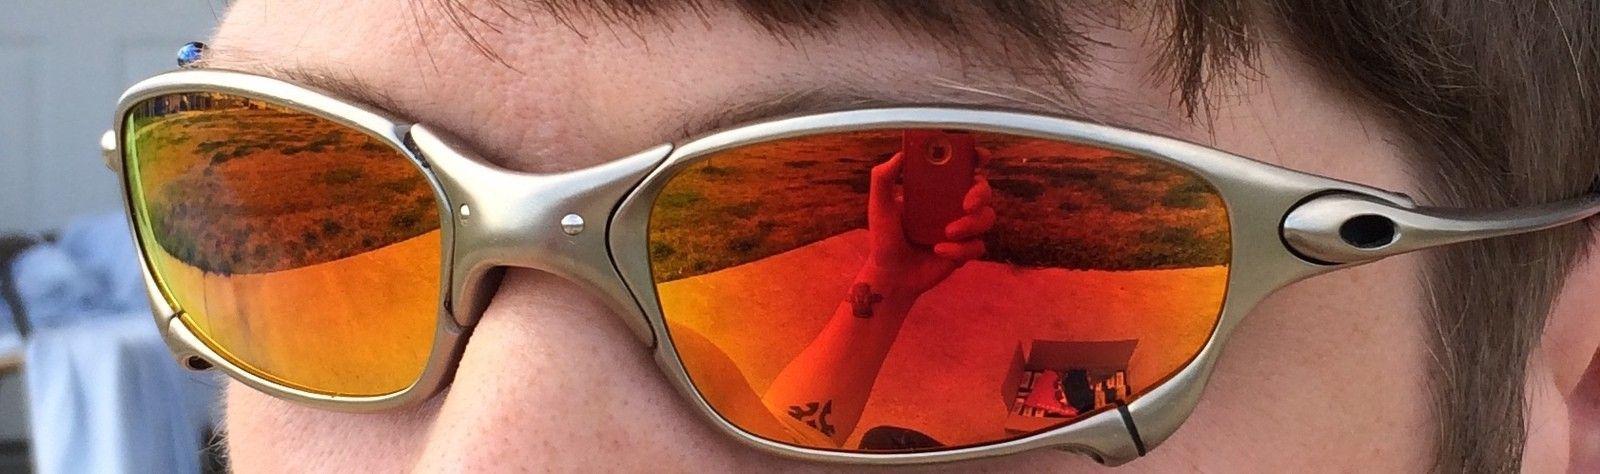 Juliet lens identification - 2015-02-22 15.04.04.jpg